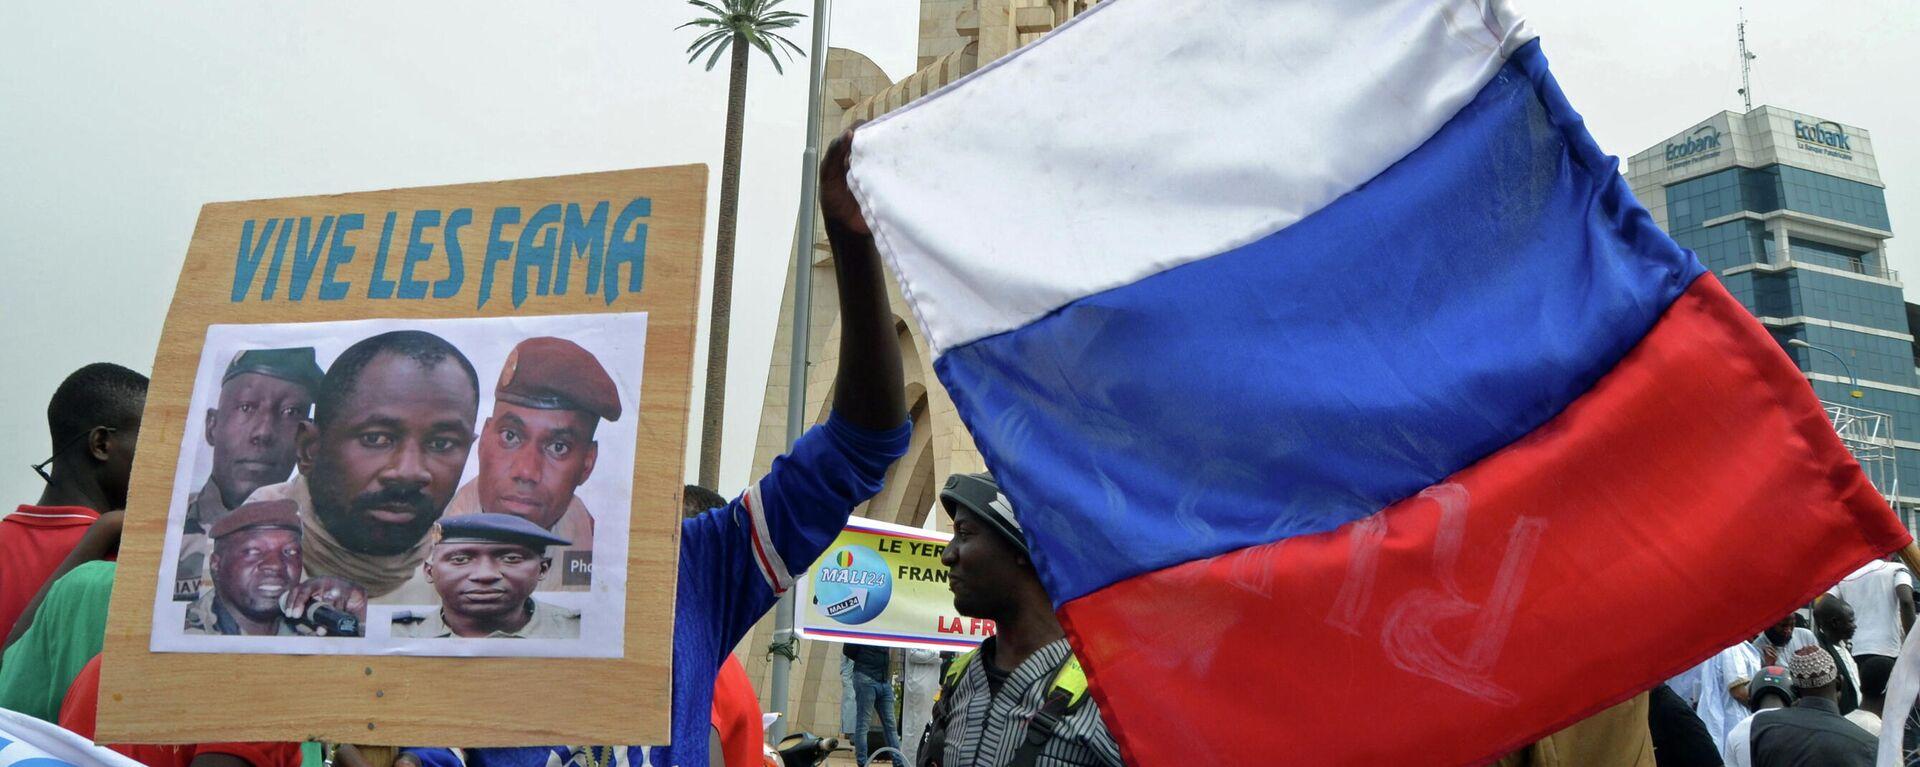 Ciudadanos de Malí con la bandera rusa - Sputnik Mundo, 1920, 09.06.2021